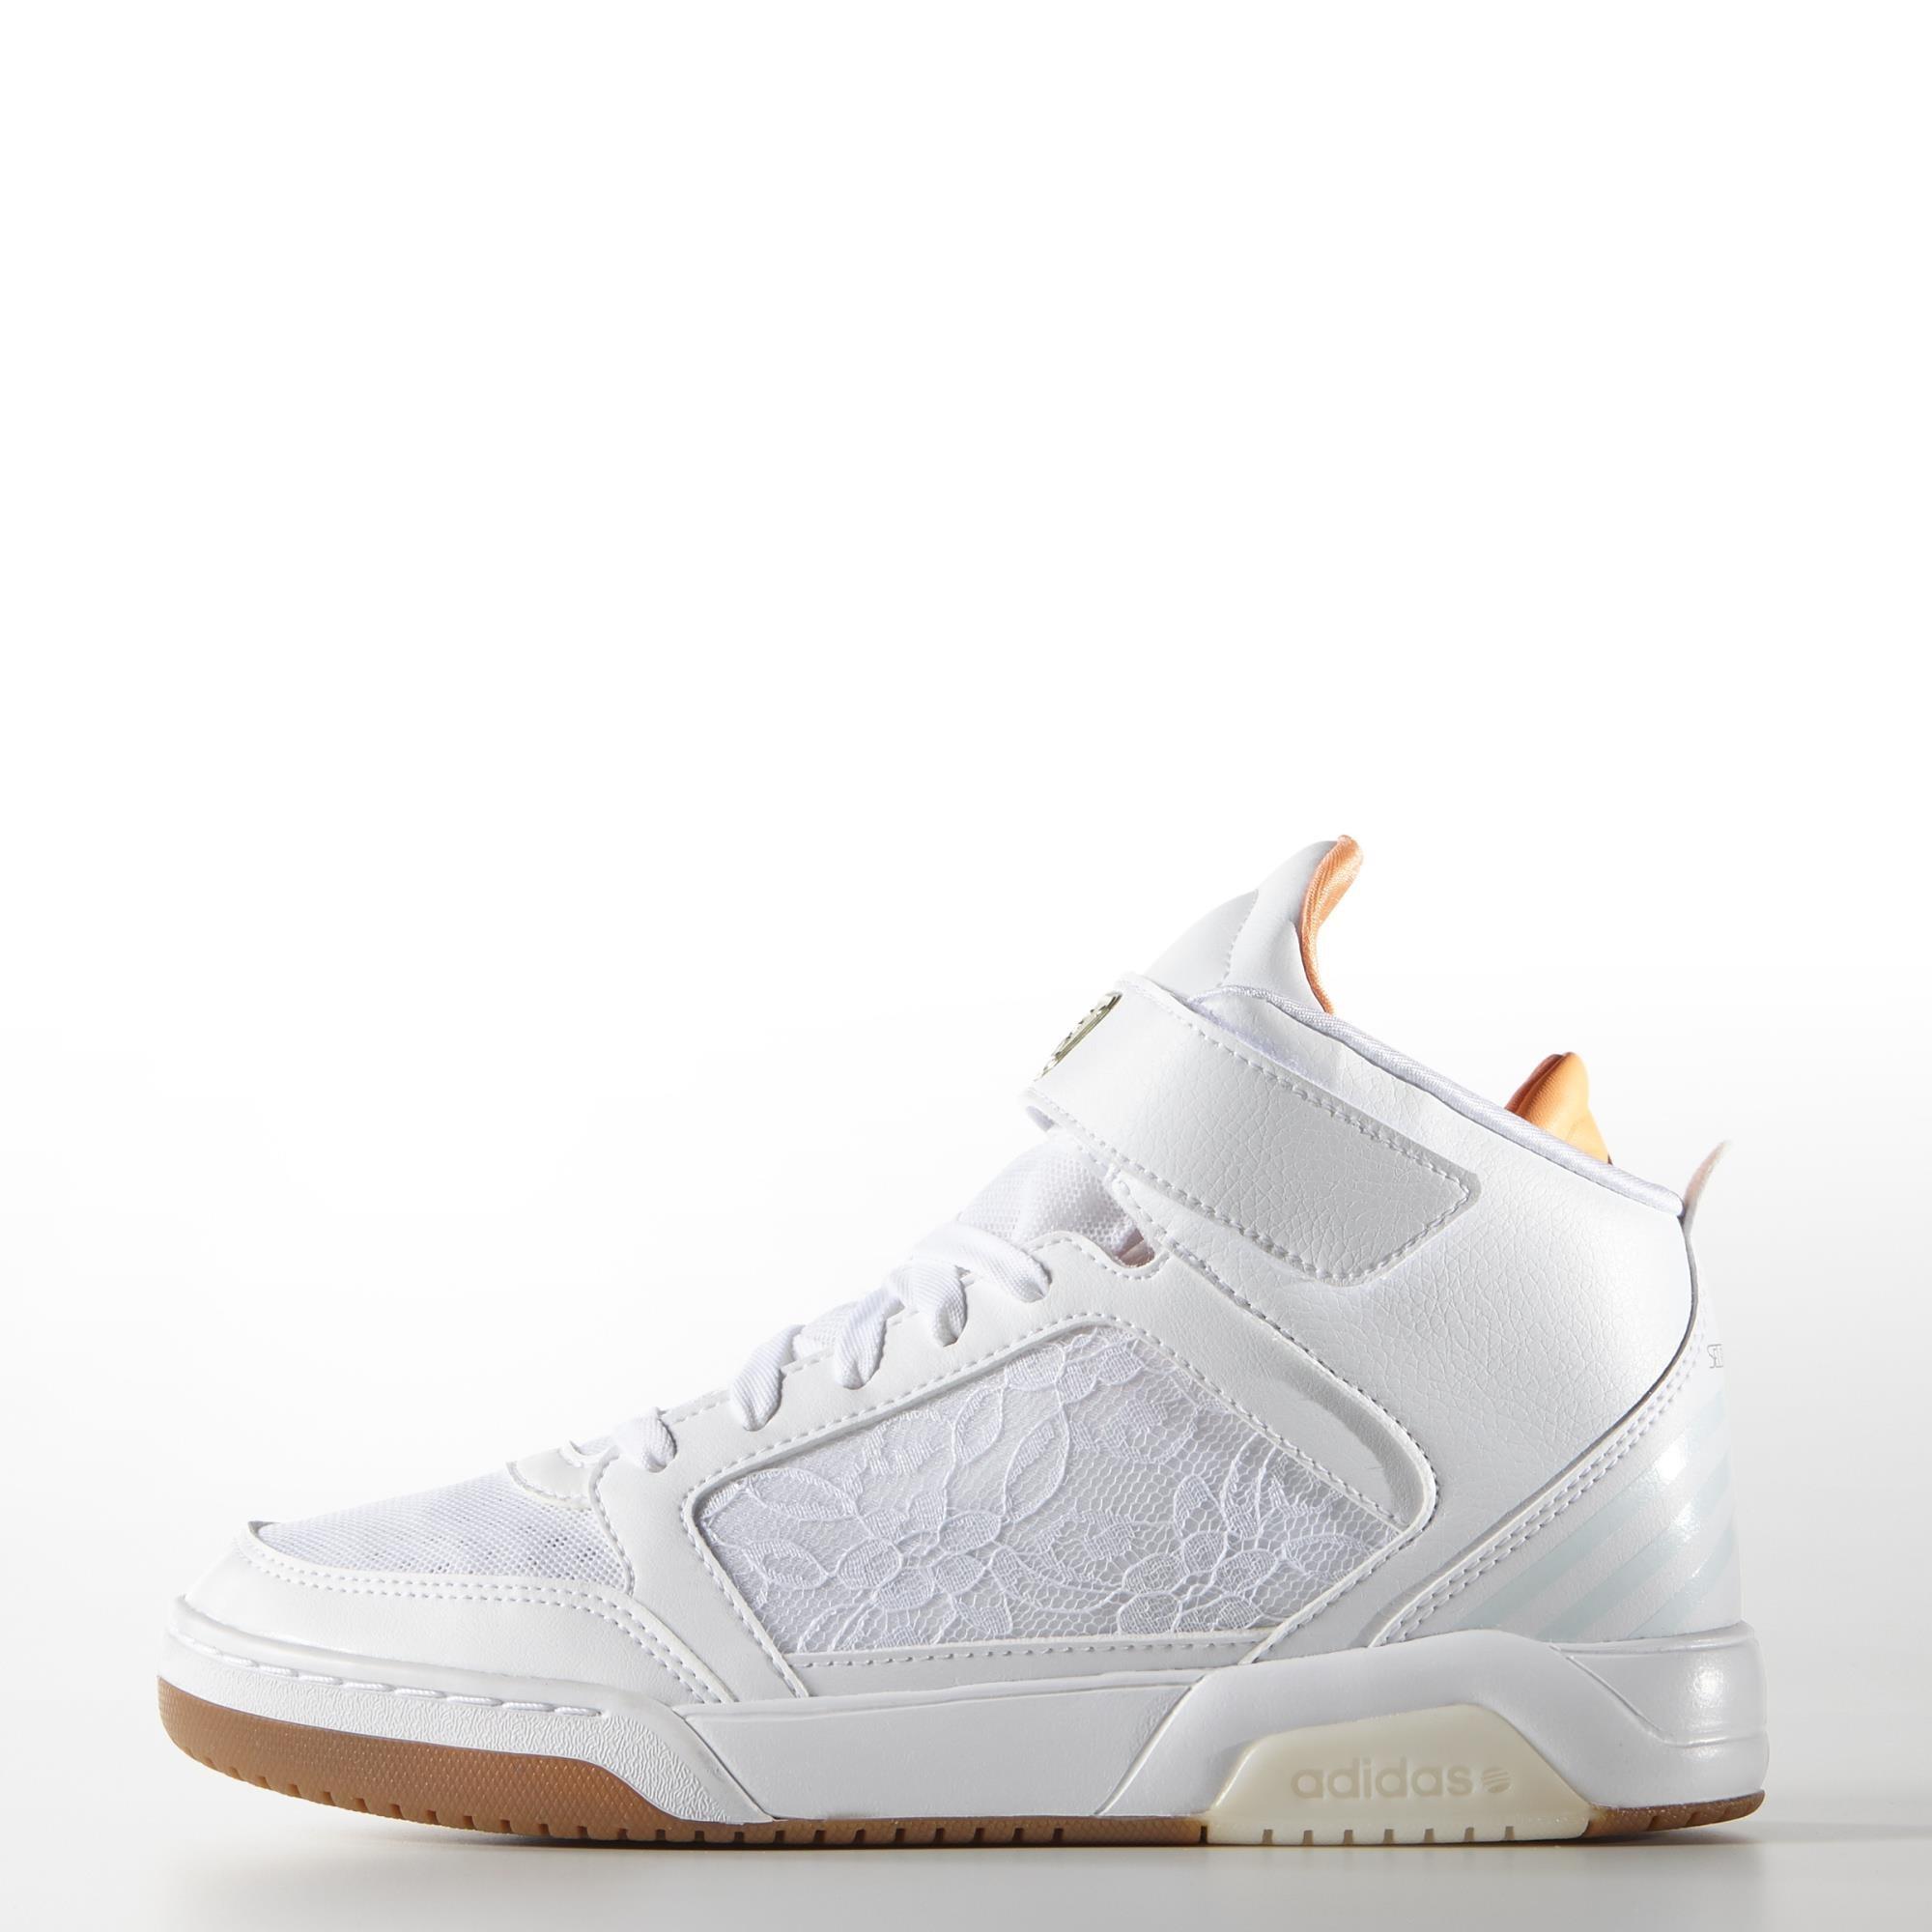 6e40984e824de ... official adidas selena gomez bb9tis lx shoes white adidas us 1989d c1c1b